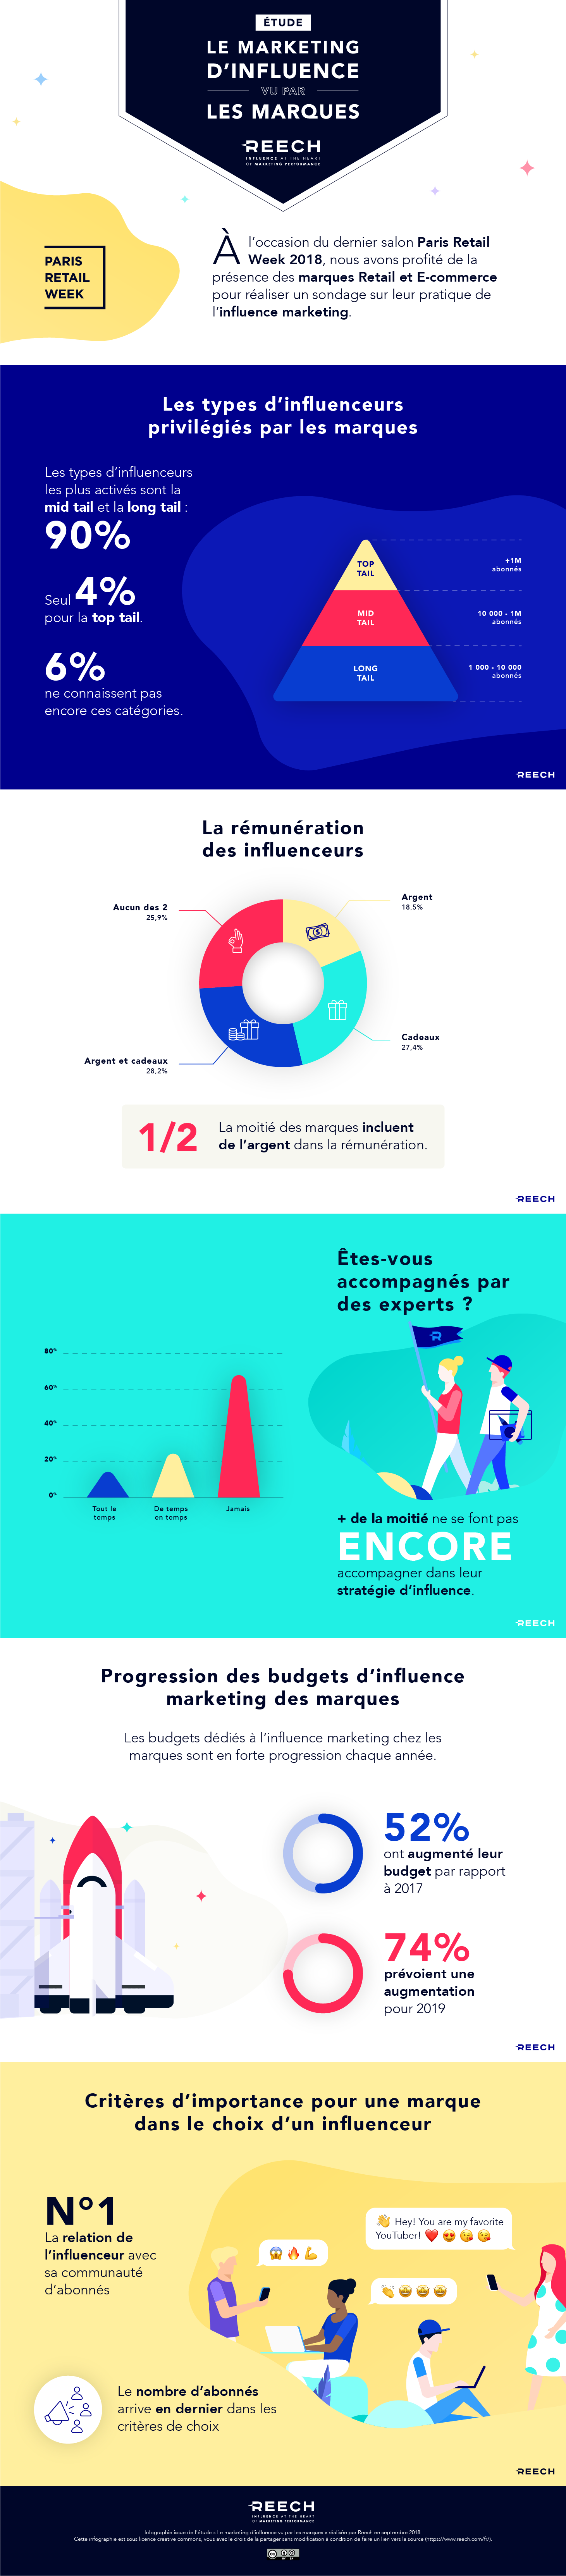 Infographie étude influenceurs